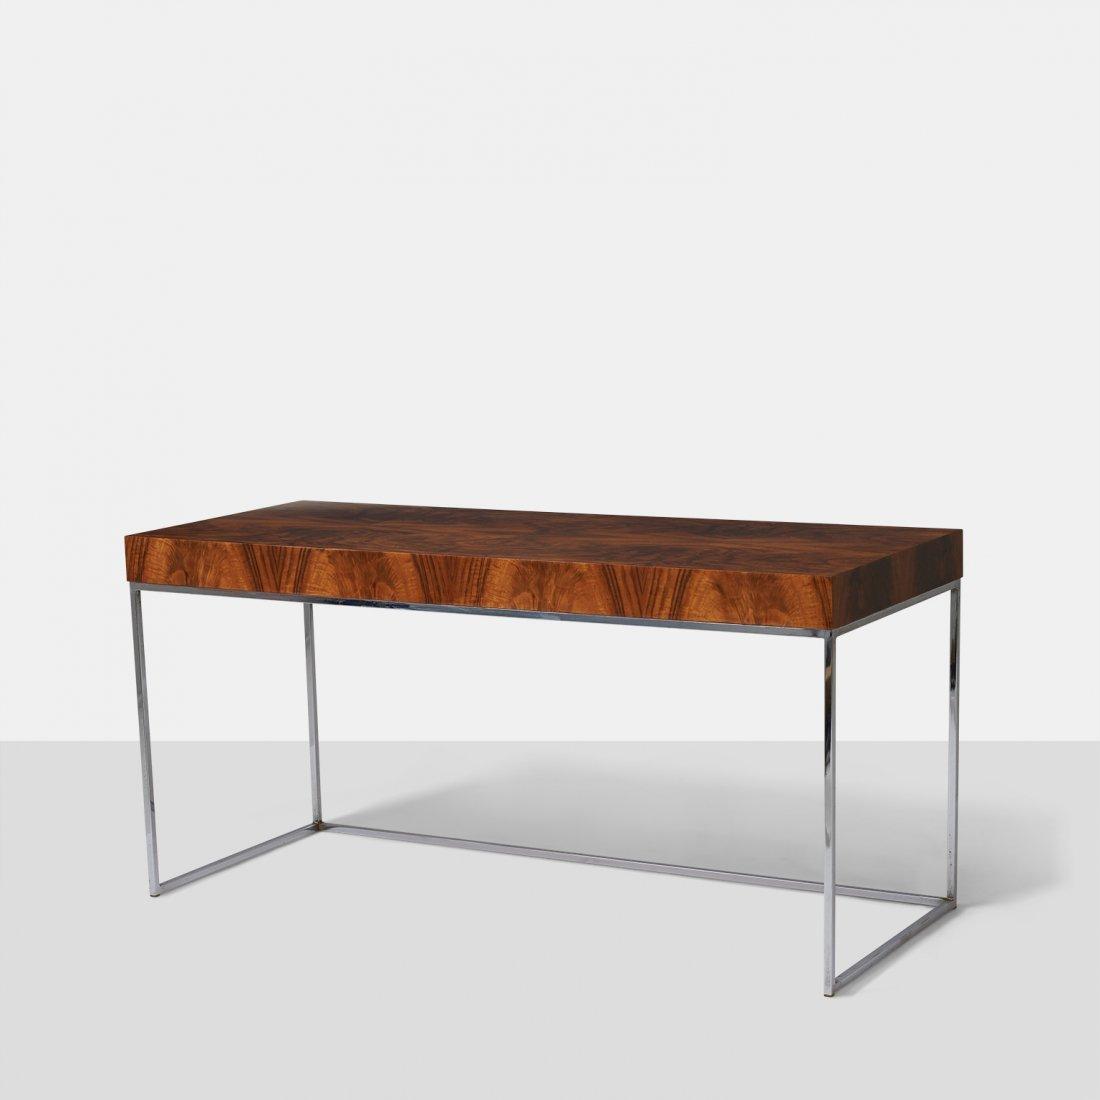 Milo Baughman, Console Table or Writing Desk